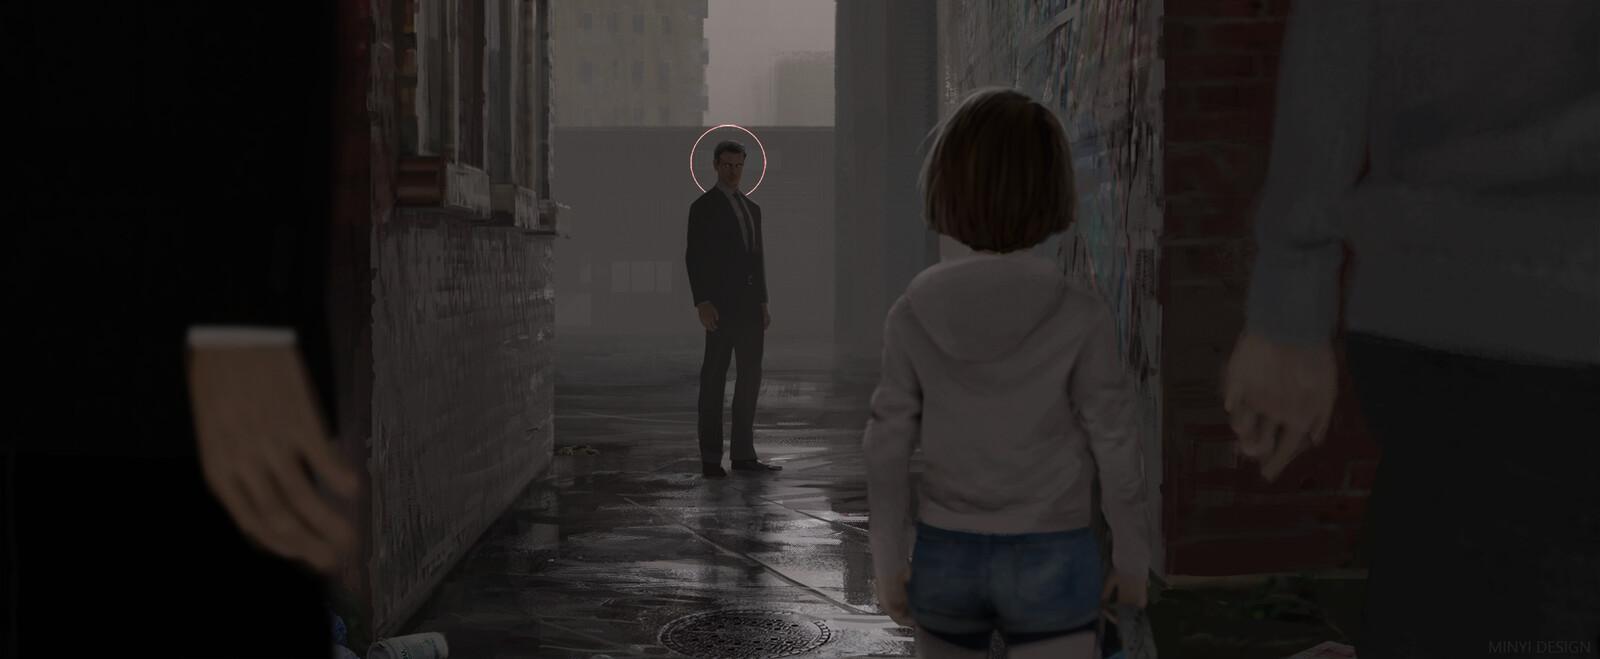 London 2040 - Agent